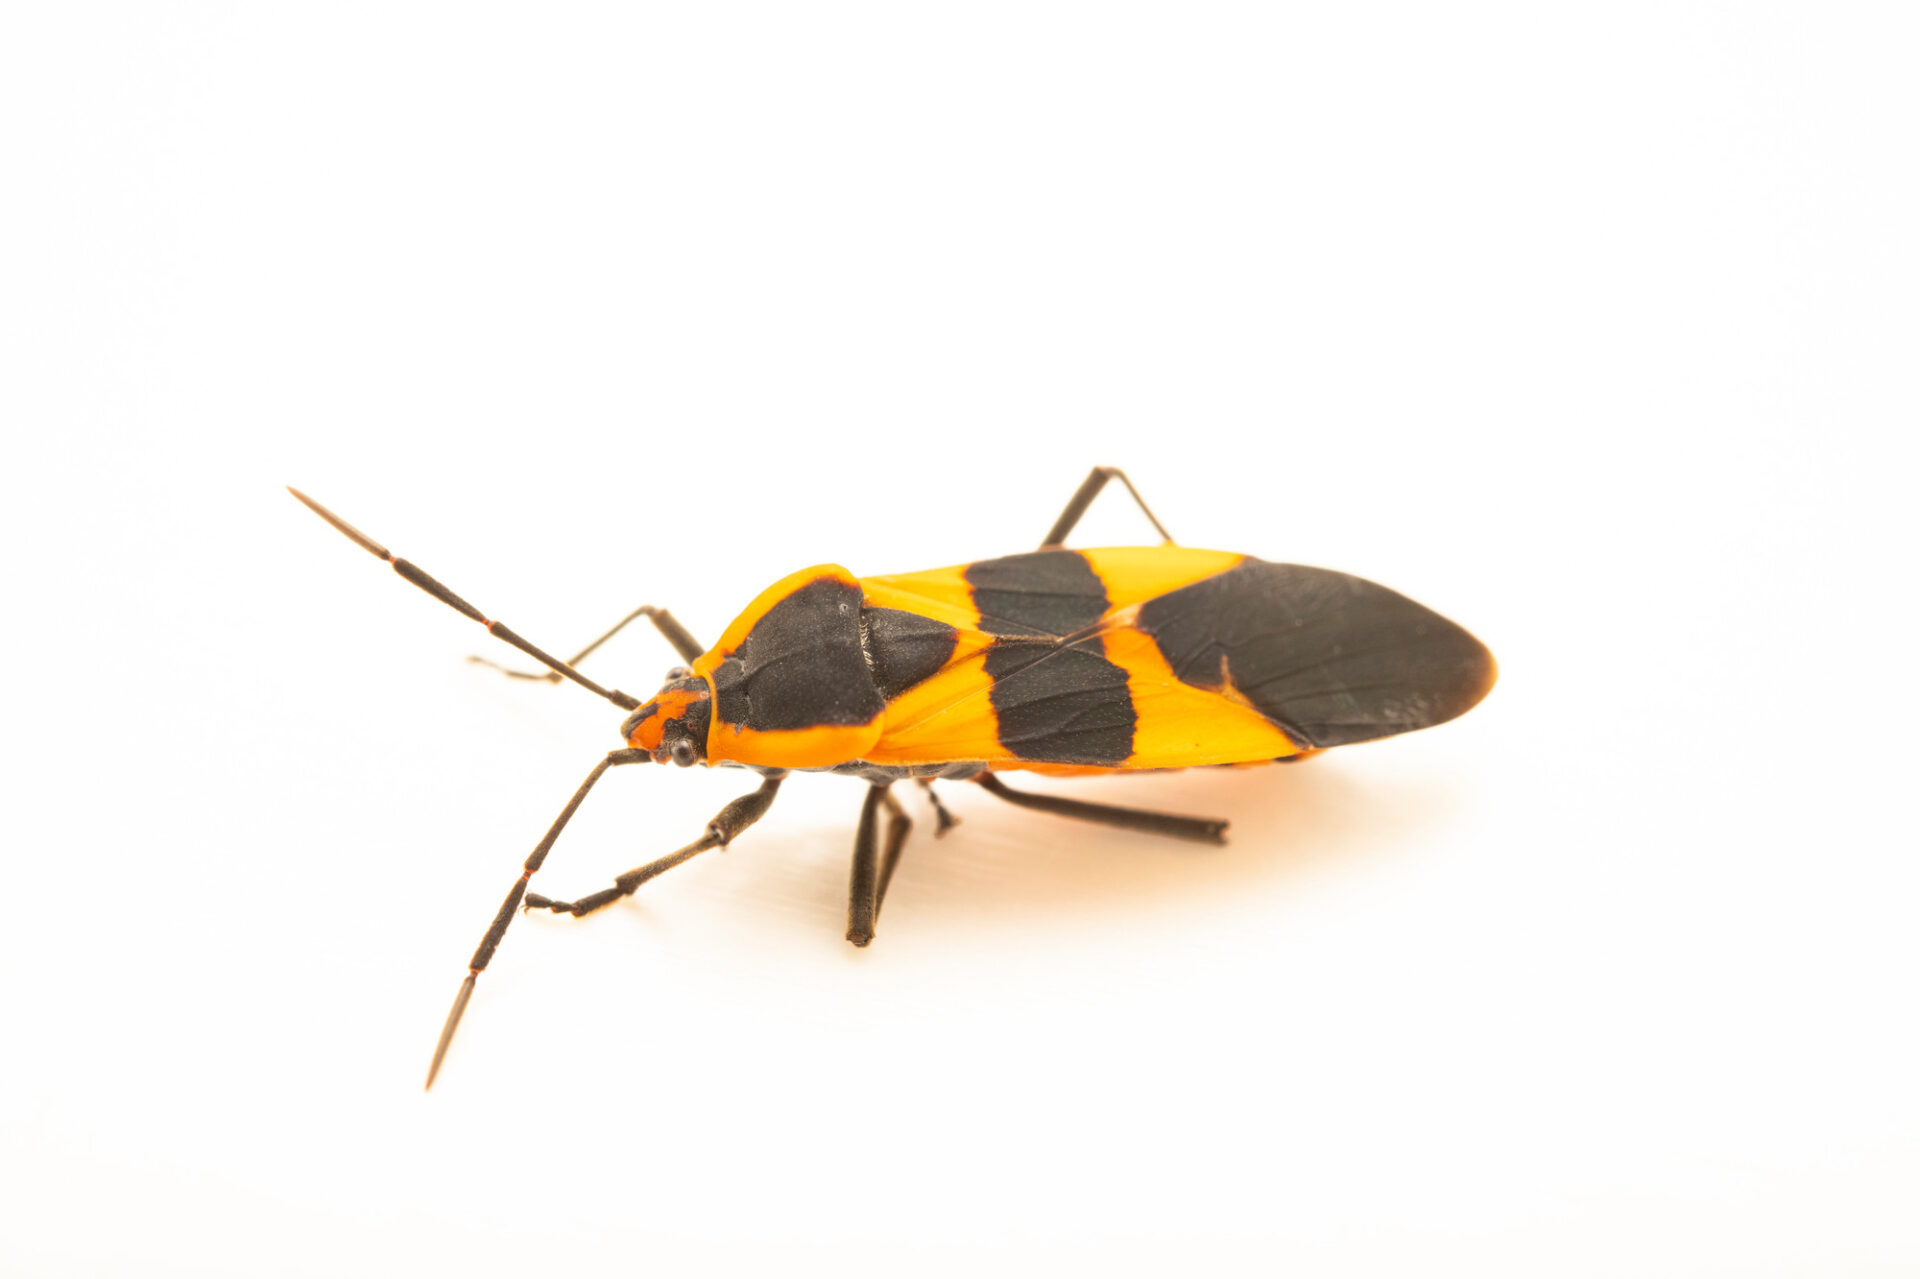 Photo: A large milkweed bug (Oncopeltus fasciatus) photographed at Spring Creek Prairie Audubon Center near Denton, NE. This animal was originally collected from Bobcat Prairie near Denton, NE.